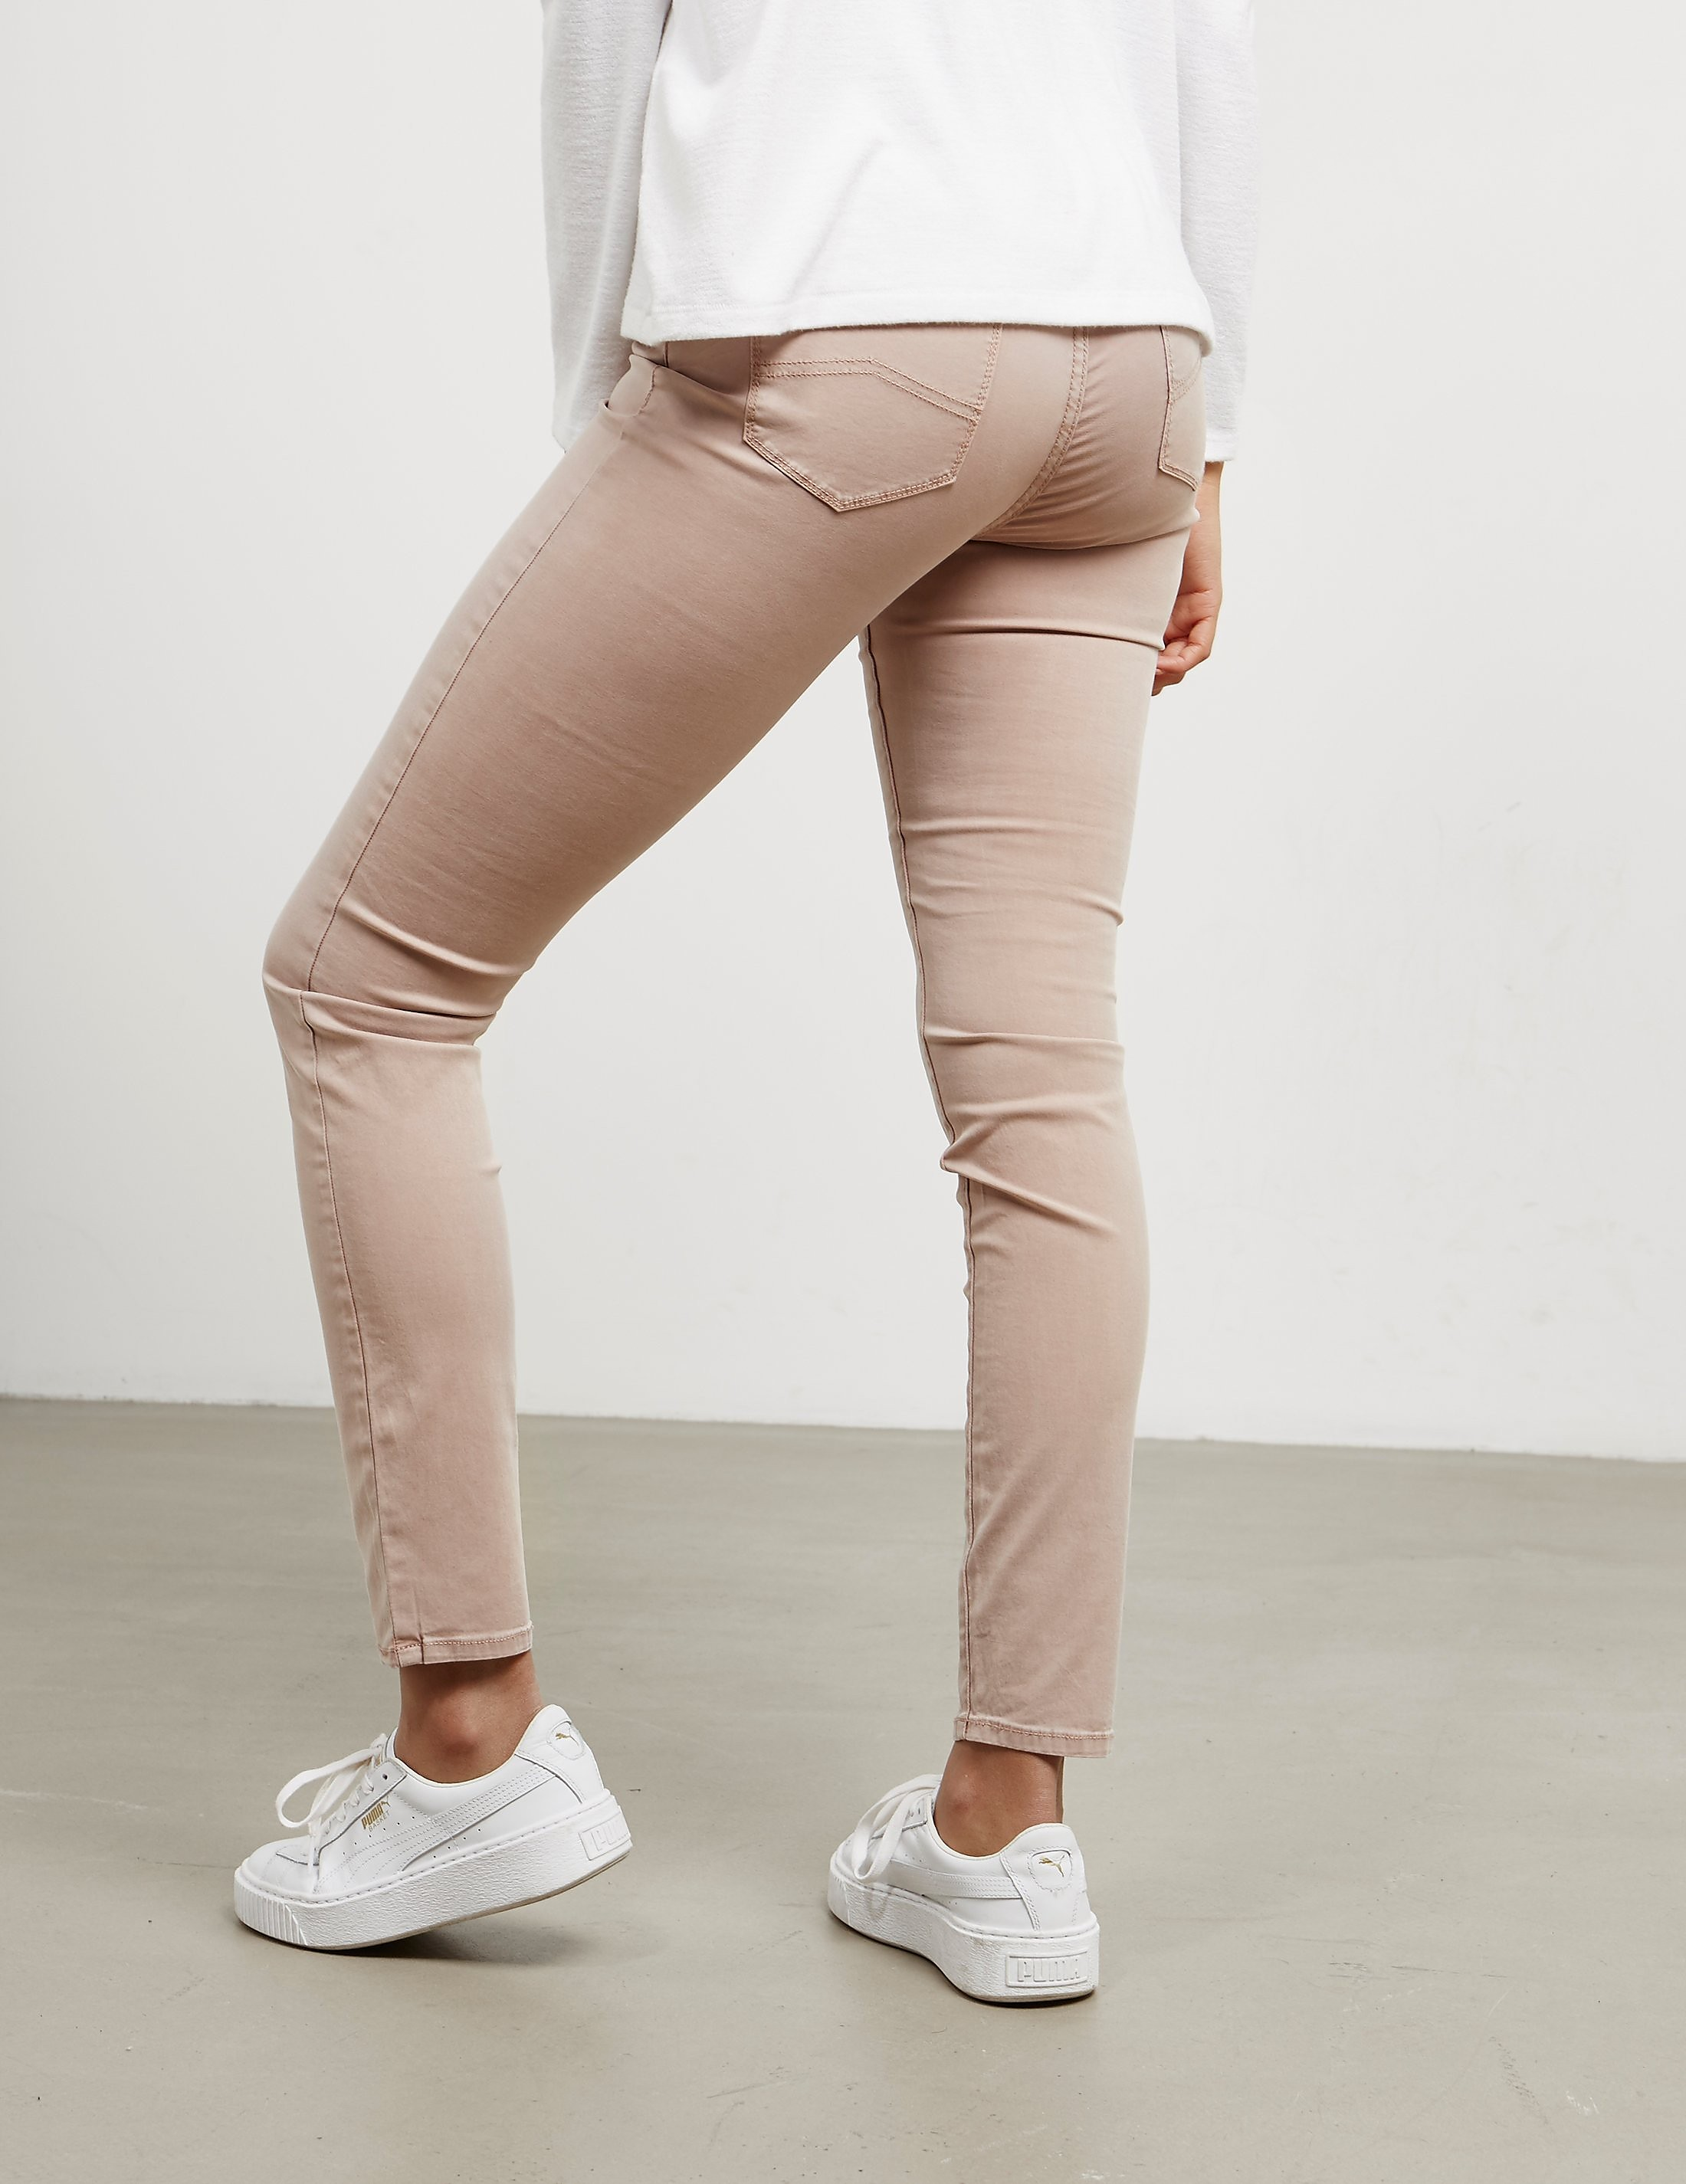 Emporio Armani J20 Jeans